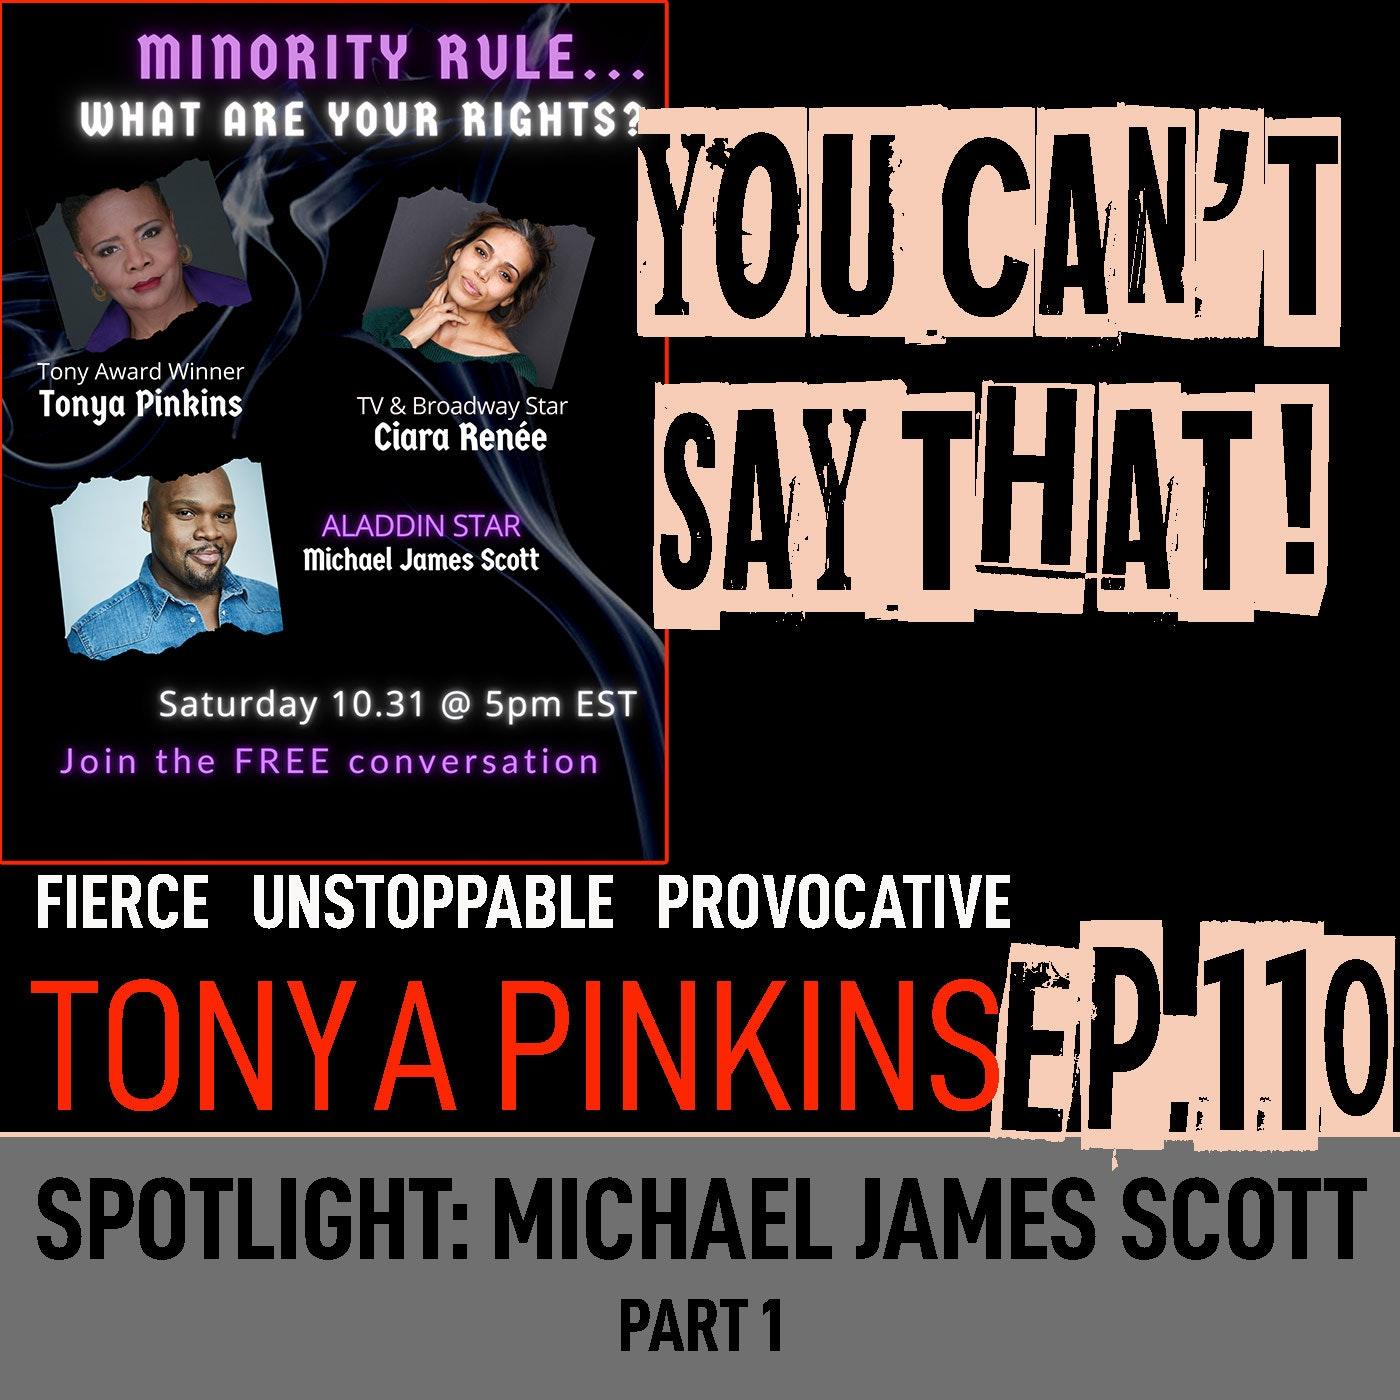 Ep110 - SPOTLIGHT: Red Pilling America with Michael James Scott (Part 1)